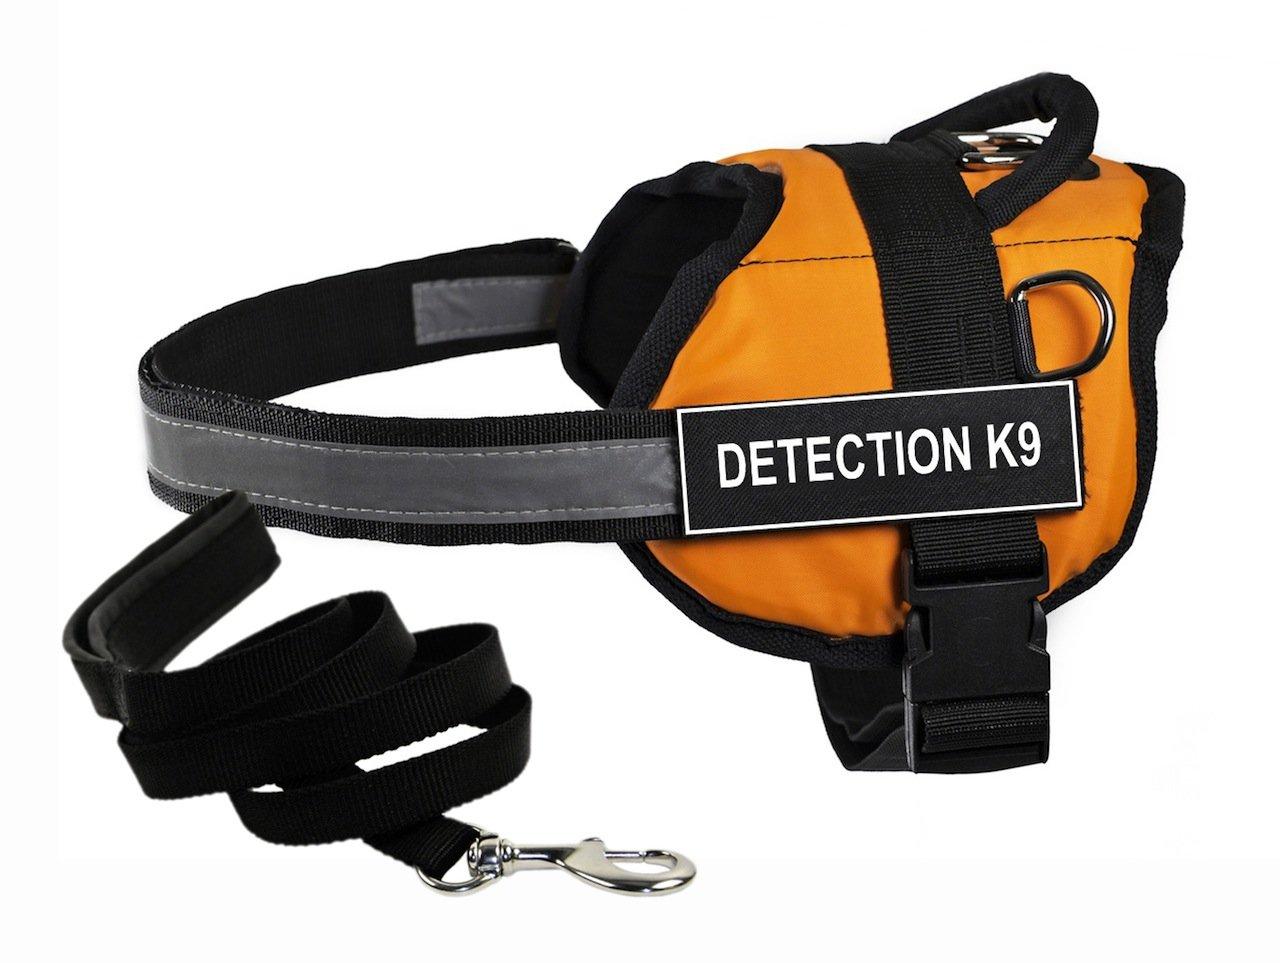 i nuovi marchi outlet online Dean & Tyler Tyler Tyler DT Works Arancione Imbracatura con Detection K9, XX-Small, e Nero 1,8 m Padded Puppy guinzaglio.  benvenuto per ordinare